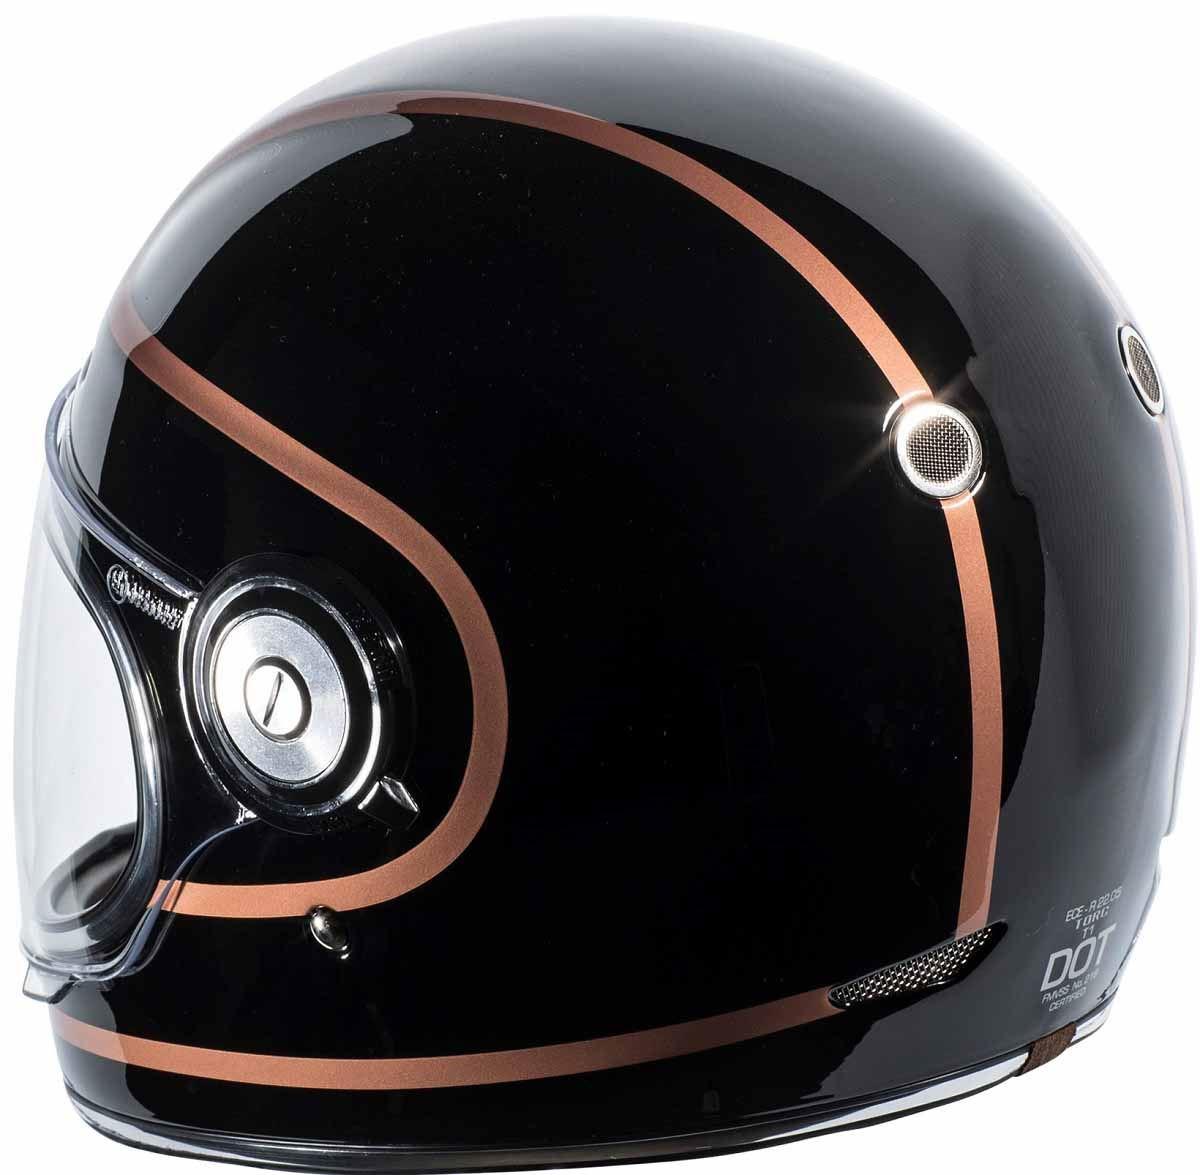 miniature 21 - Torc T1 Helmet Retro Vintage Style Fiberglass DOT Approved XS-2XL